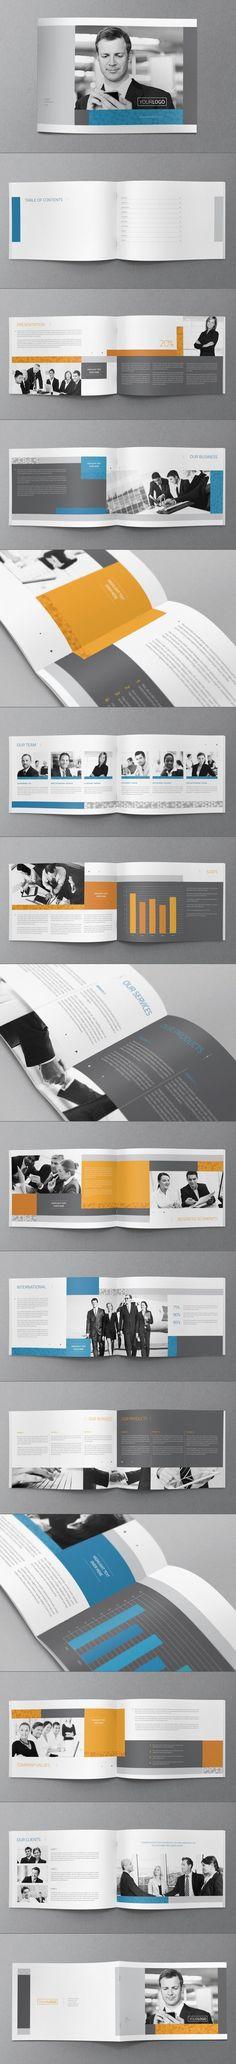 Corporate Brochure Design by Abra Design, via Behance